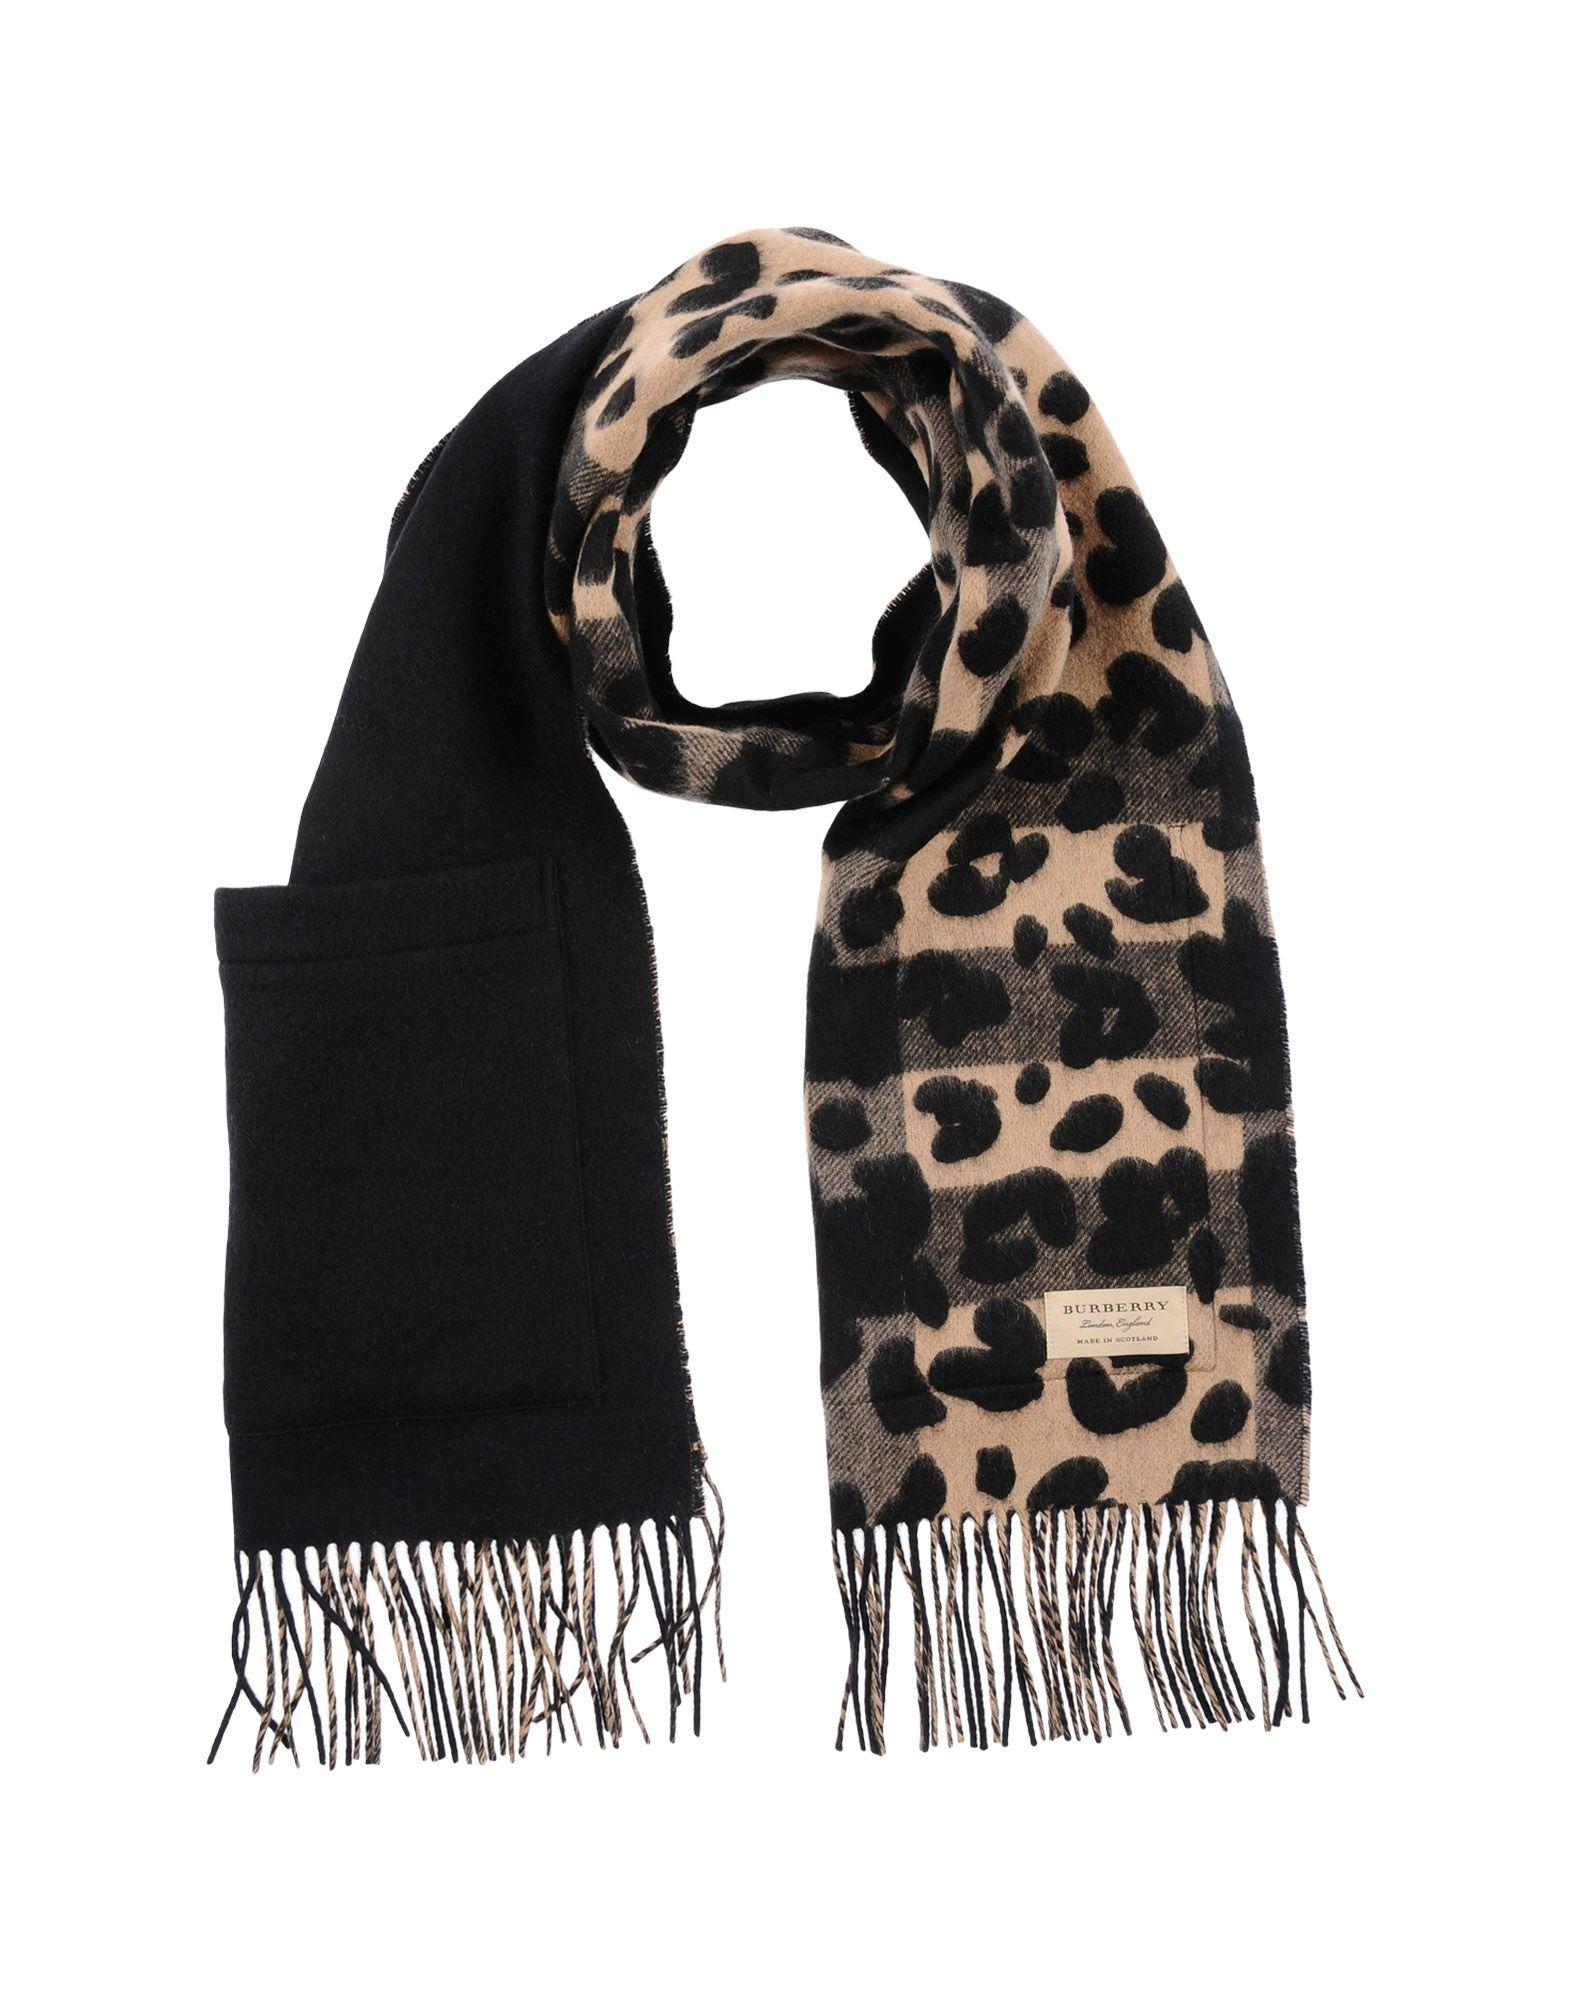 cd7cf2e9e2a Buy burberry accessories for women - Best women s burberry accessories shop  - Cools.com